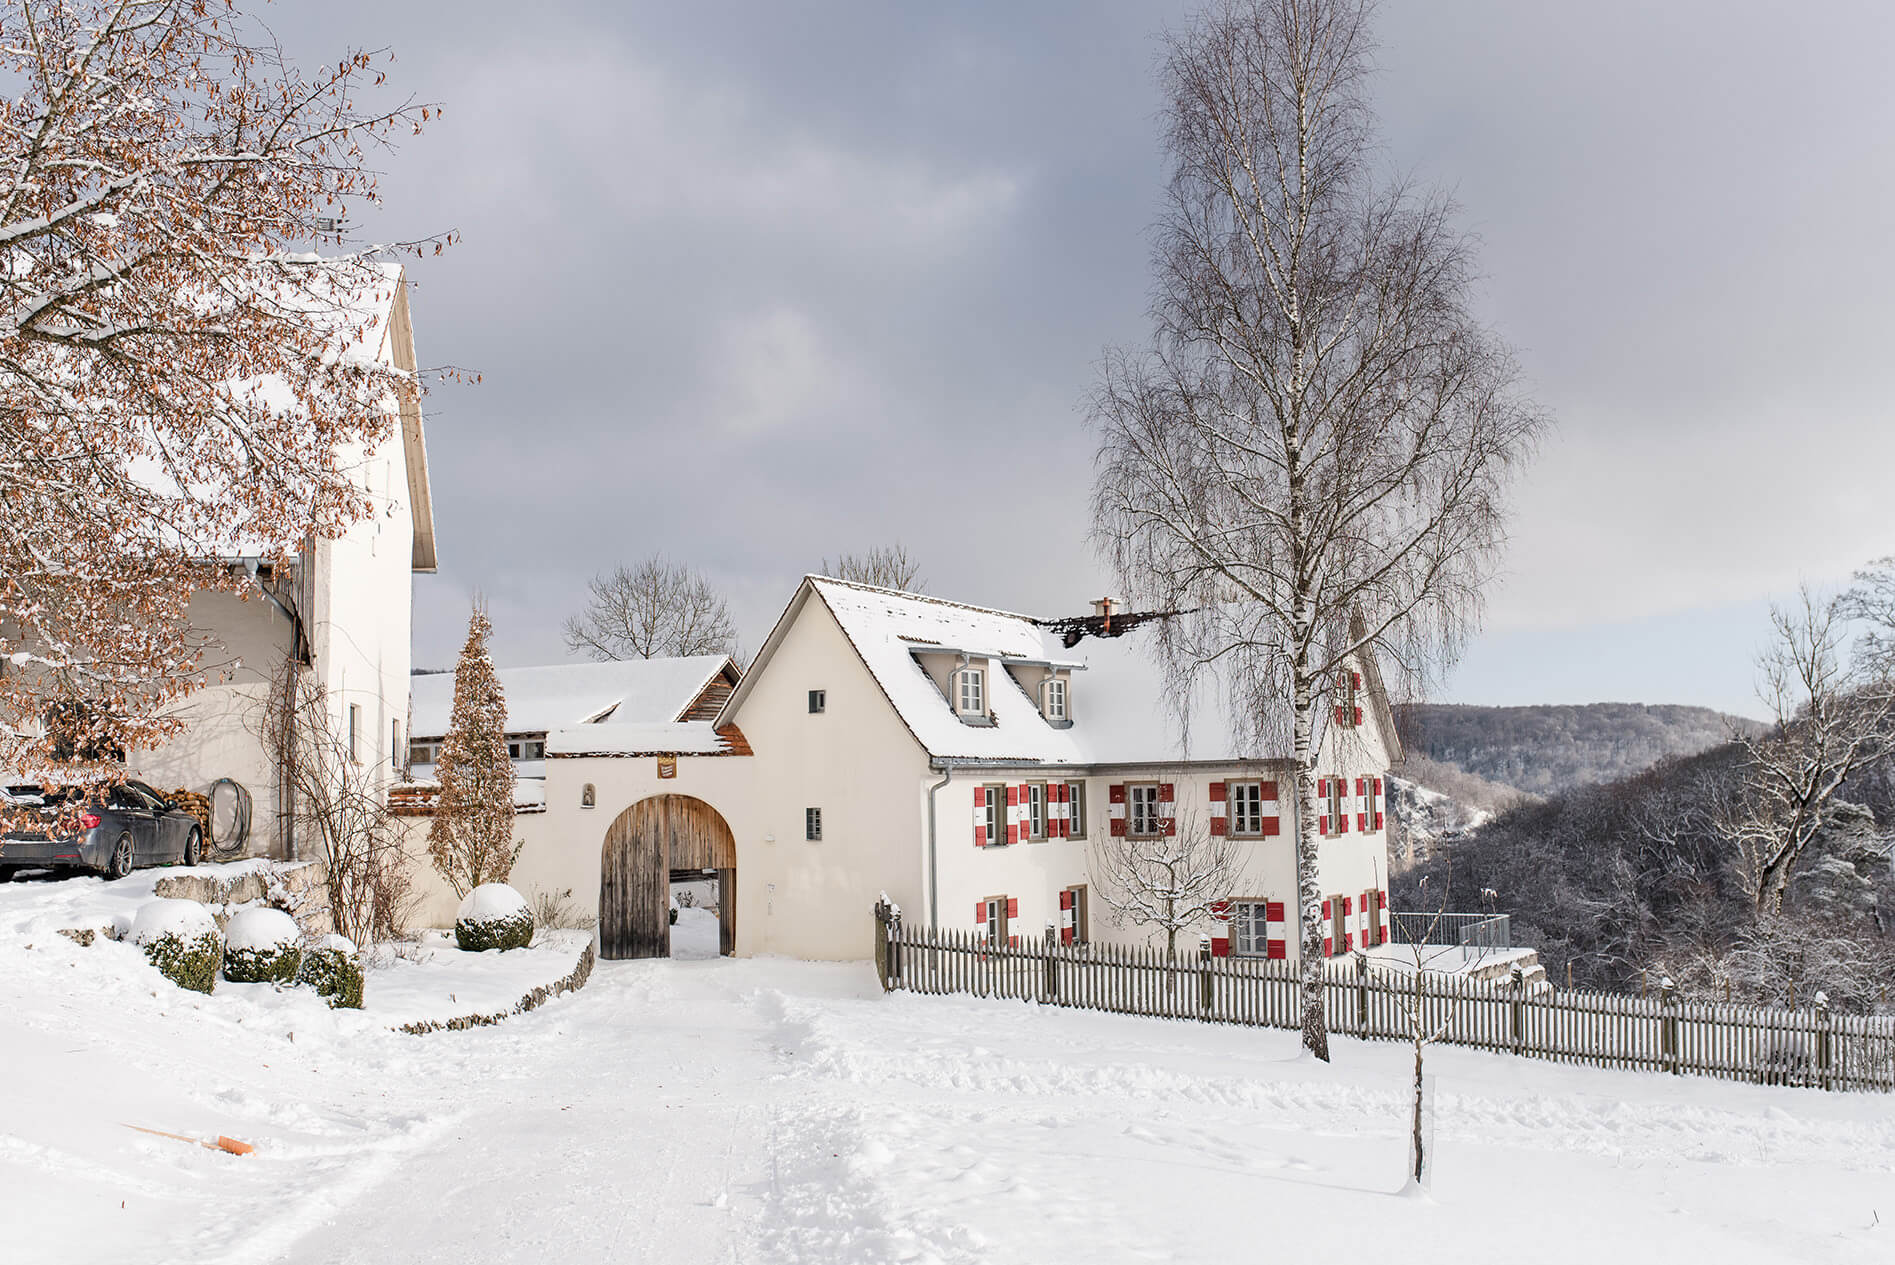 Rebecca Conte Fotografie Stuttgart: Burg im Winter